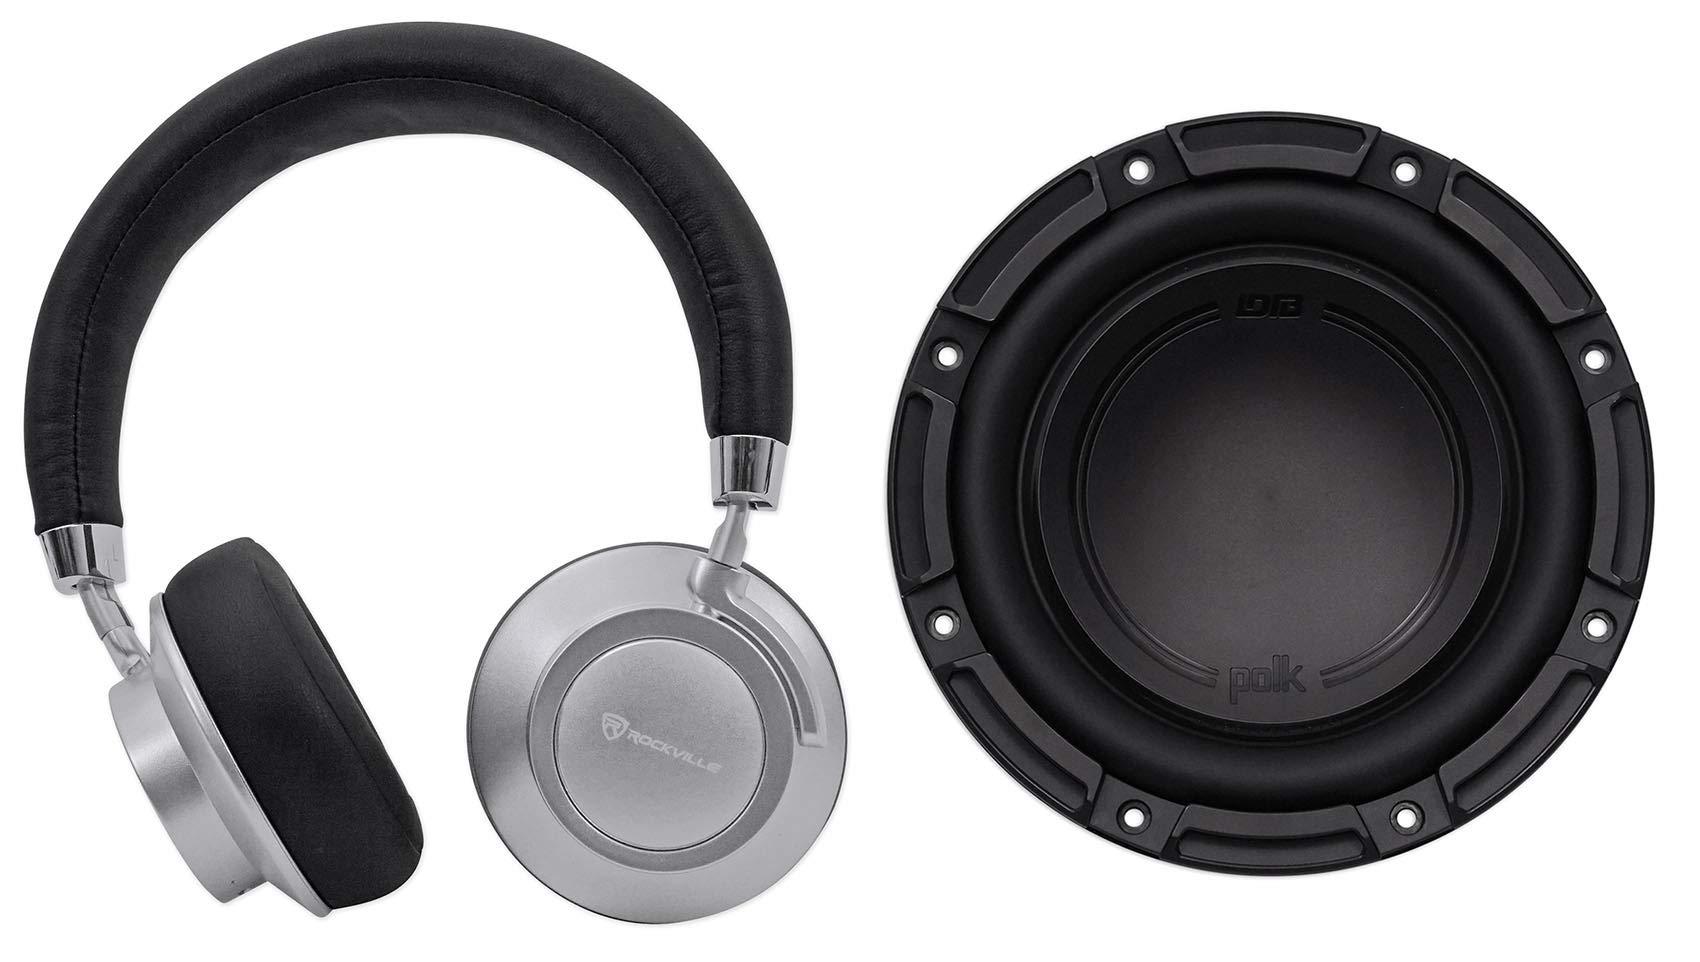 Polk Audio DB842SVC 8 750 Watt Car/Marine Boat Audio Subwoofer Sub+Headphones